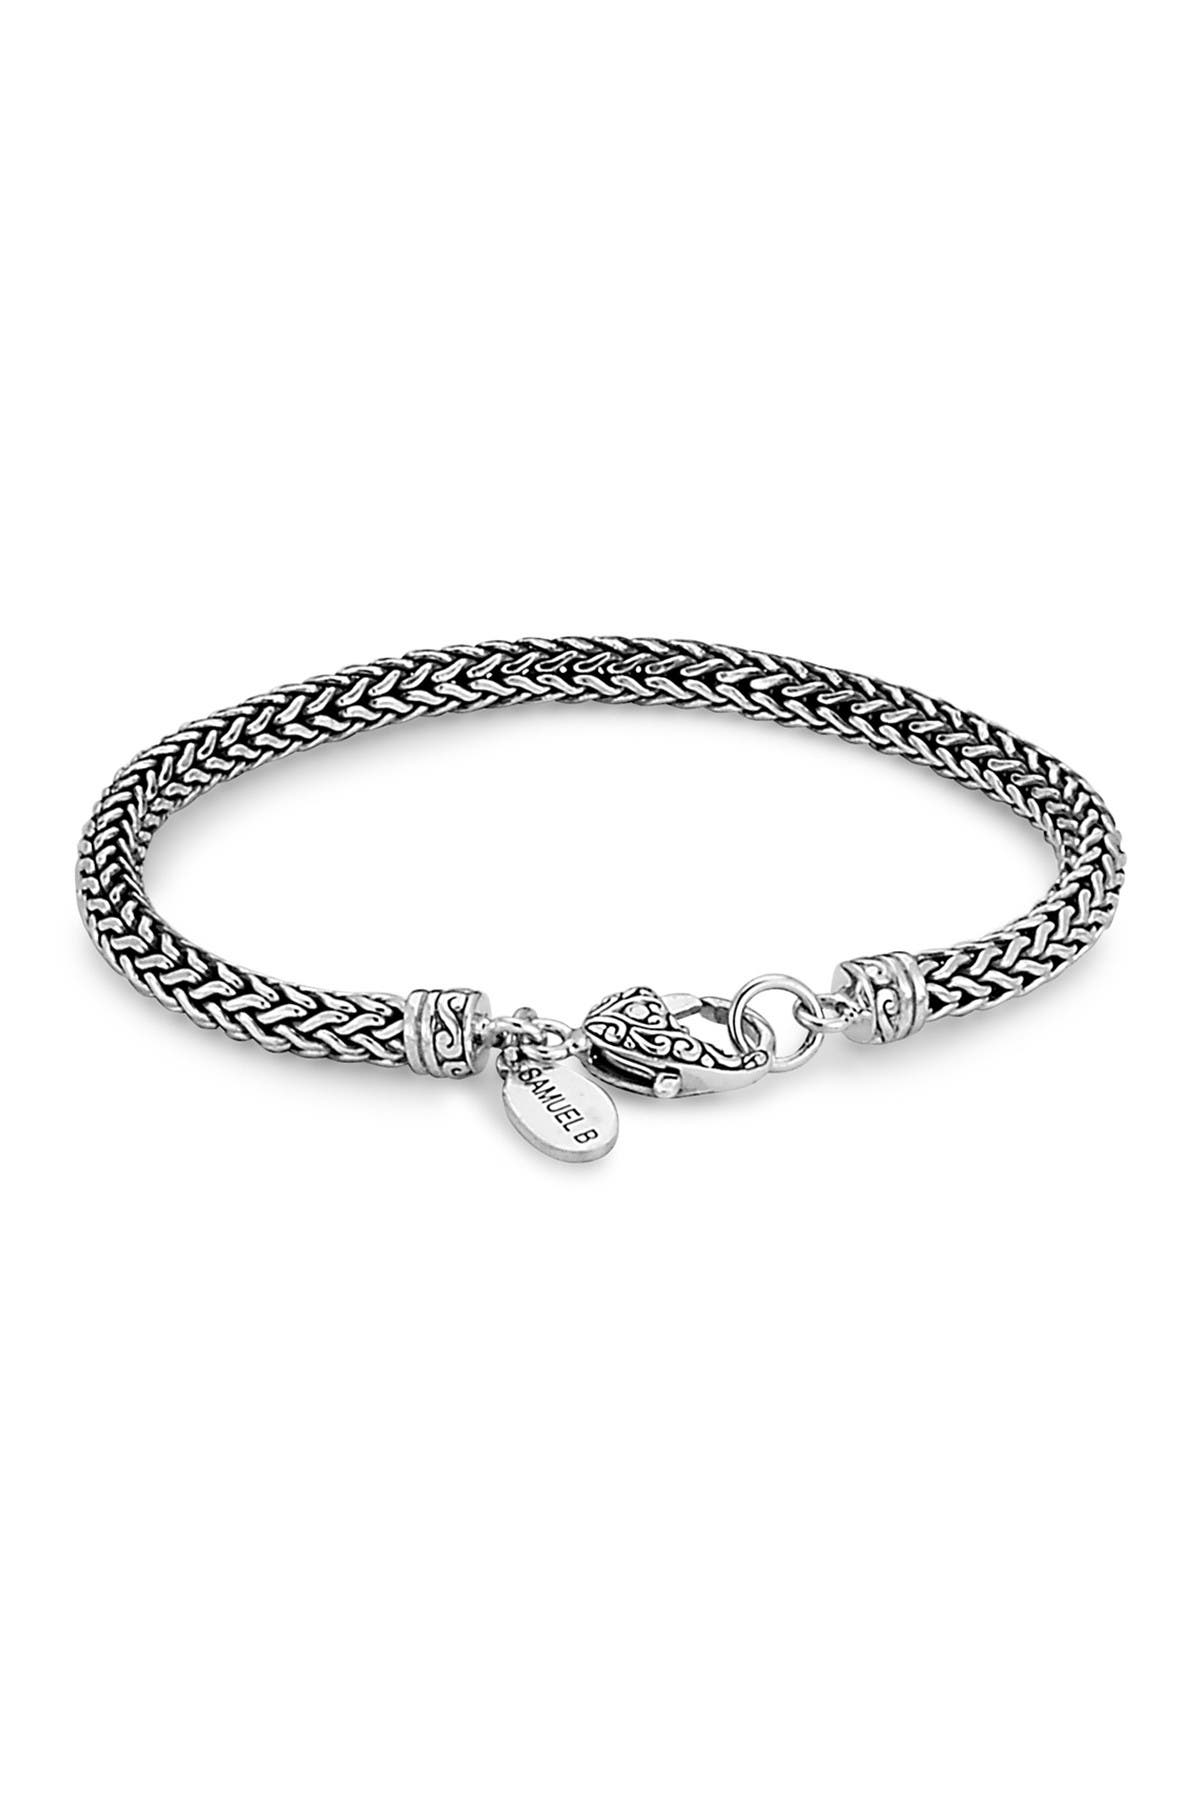 Image of Samuel B Jewelry Sterling Silver Tulang Naga Bracelet